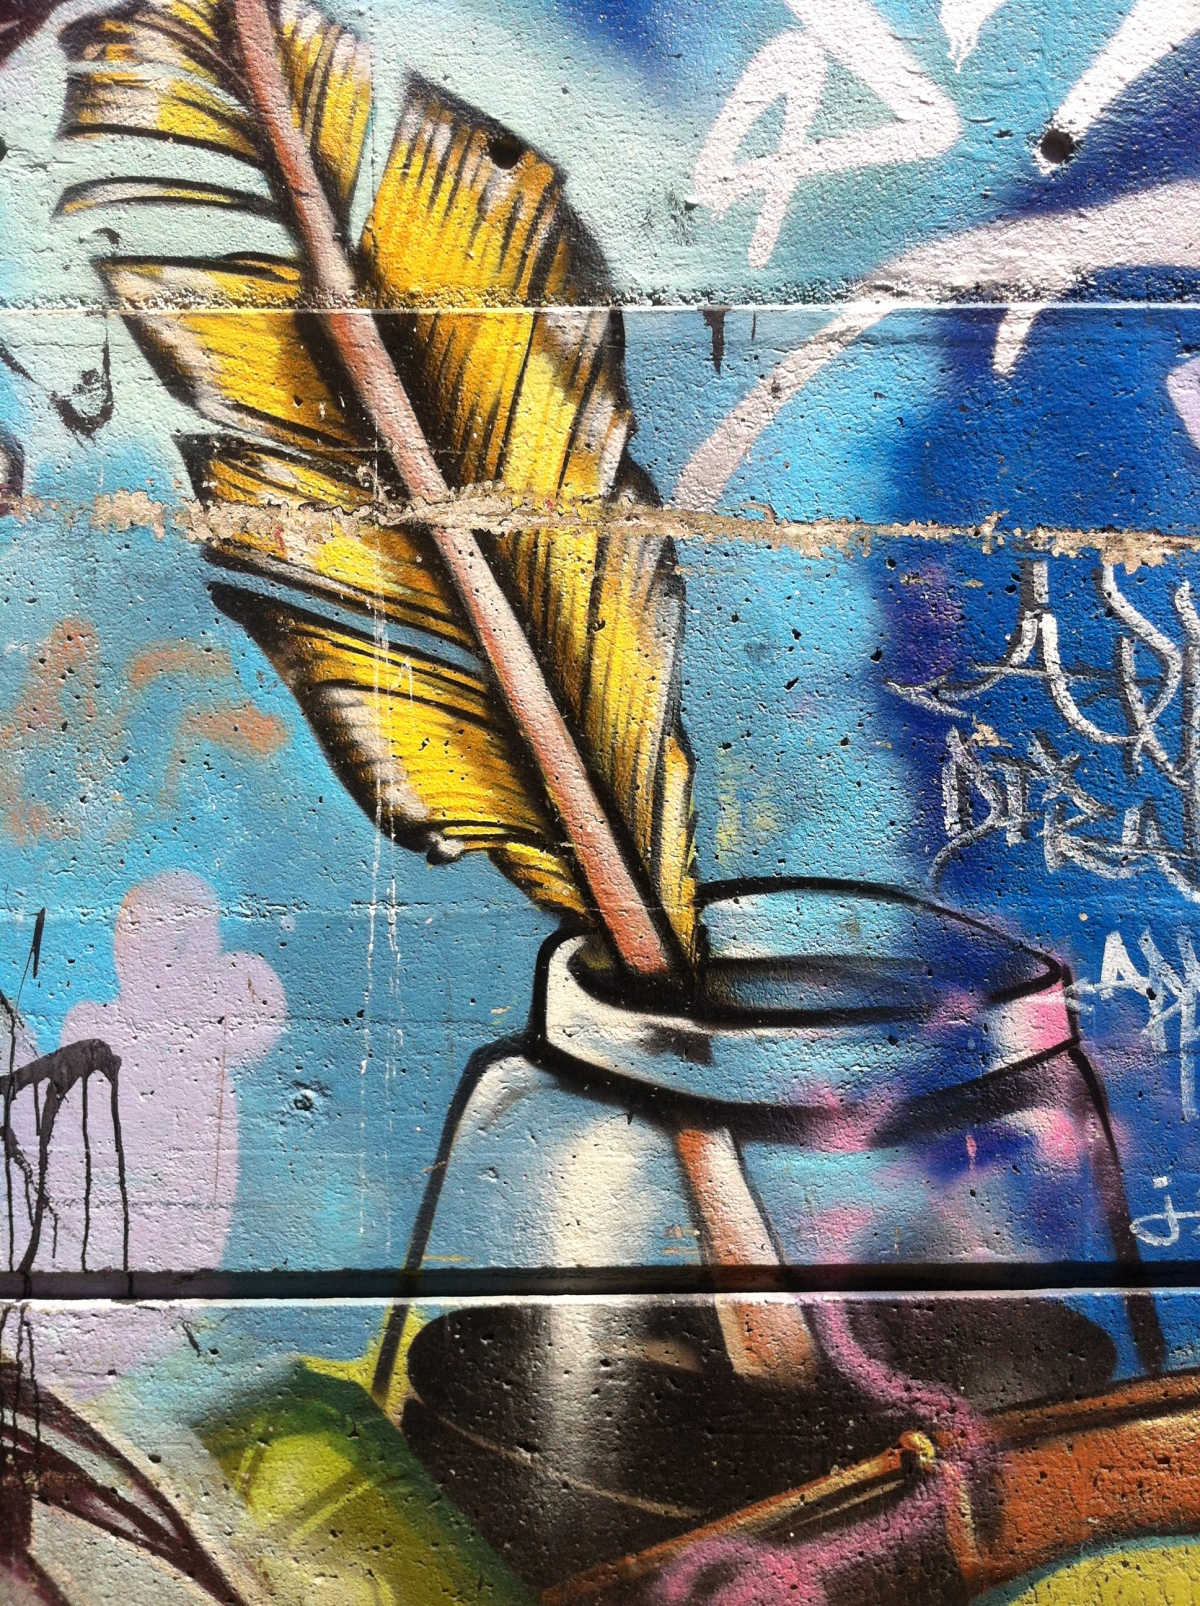 28. Street Art Scene inVancouver